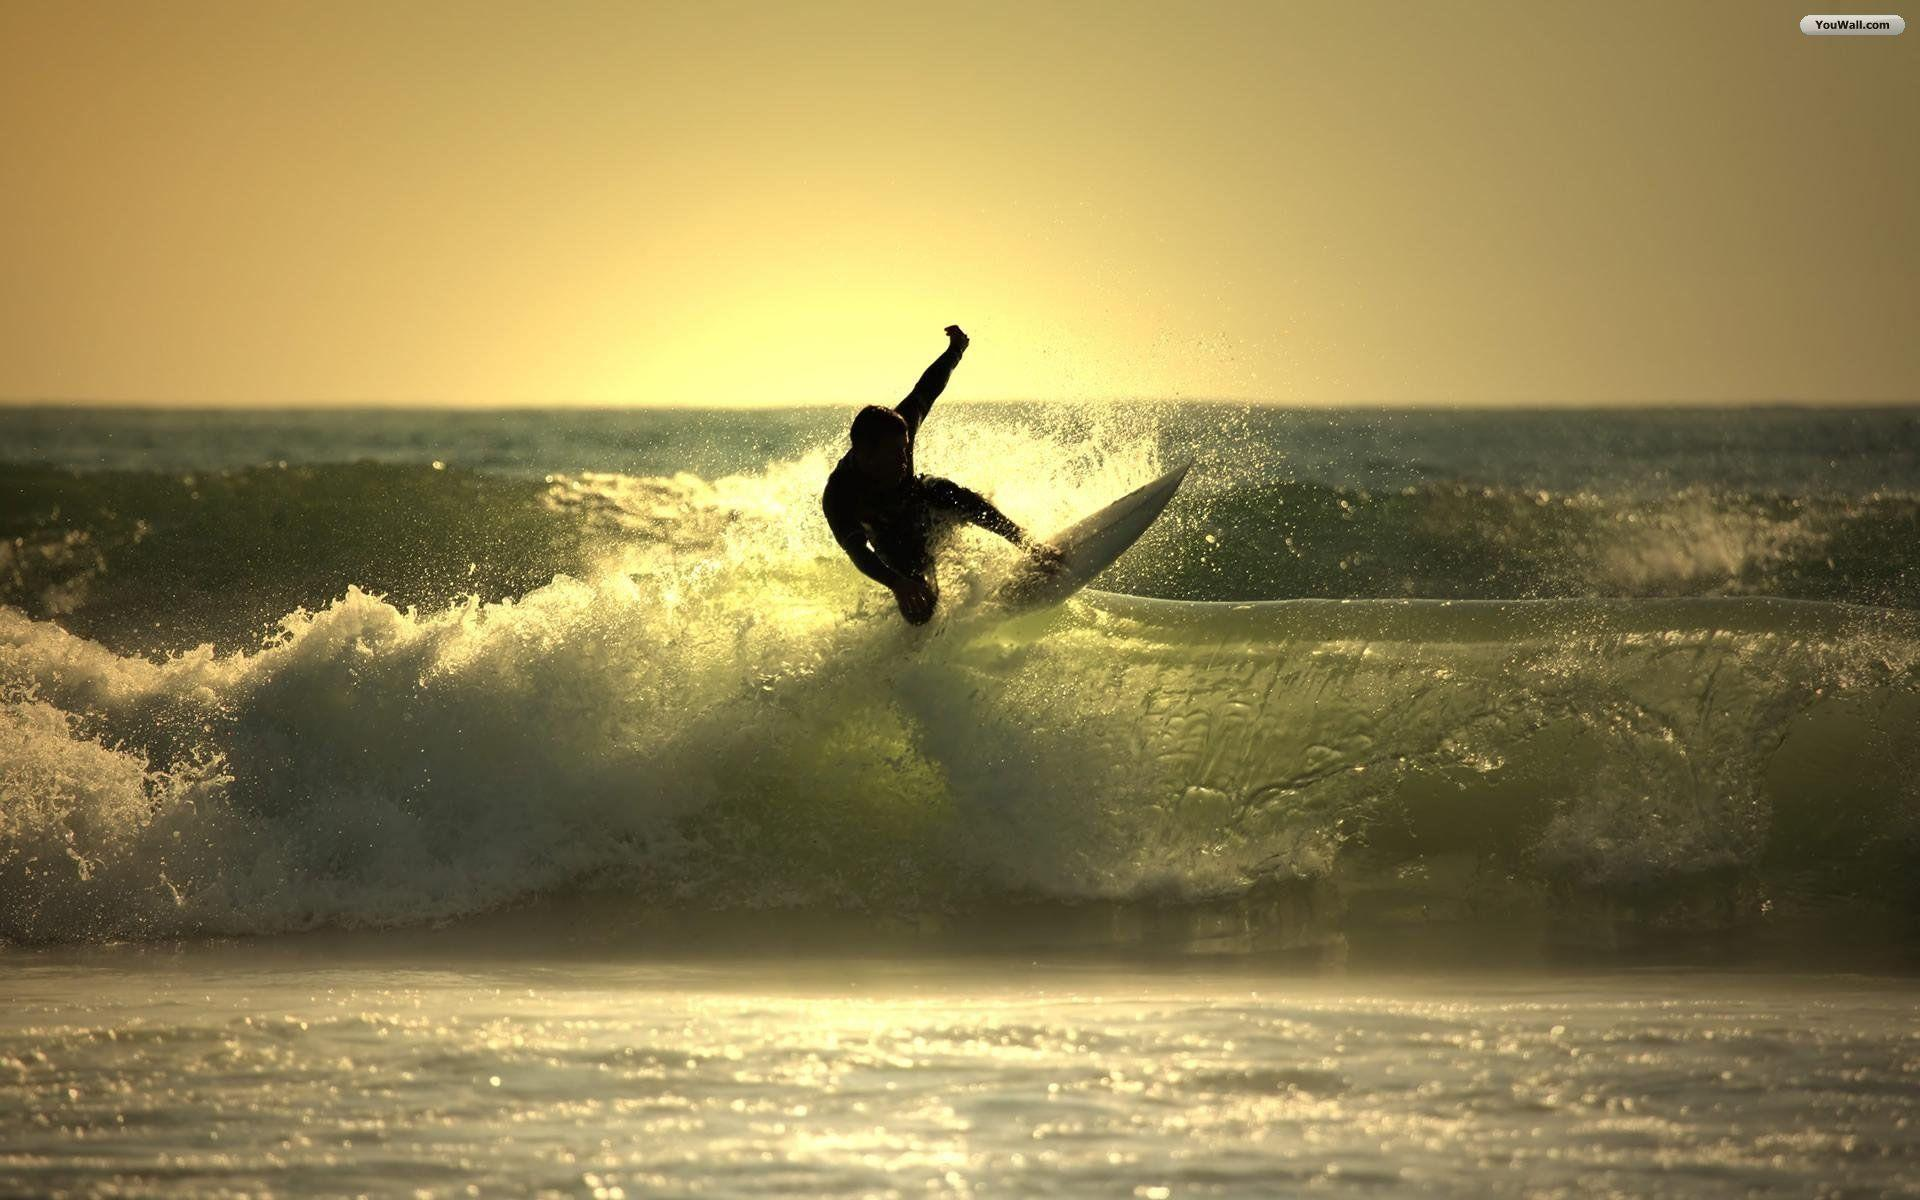 Surfing Desktop Backgrounds - Wallpaper Cave